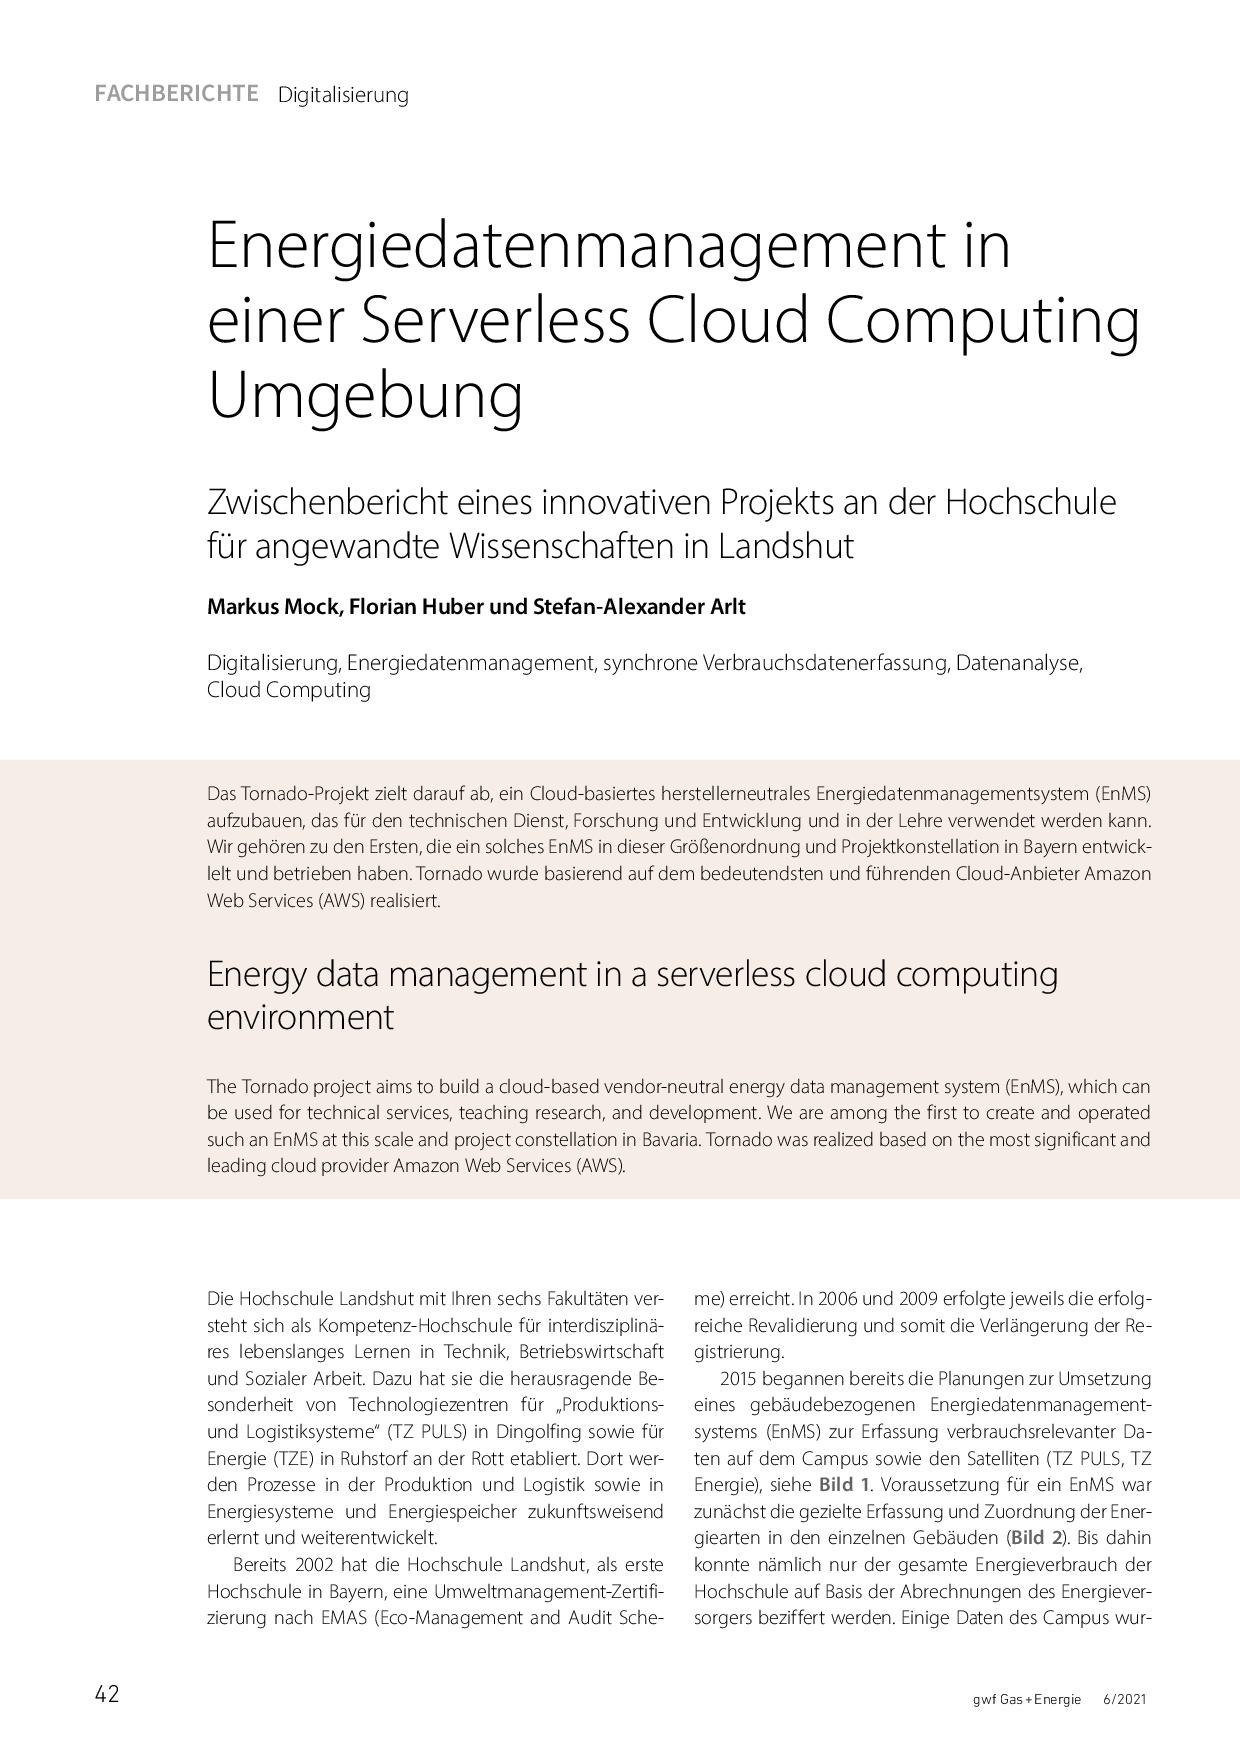 Energiedatenmanagement in einer Serverless Cloud Computing Umgebung